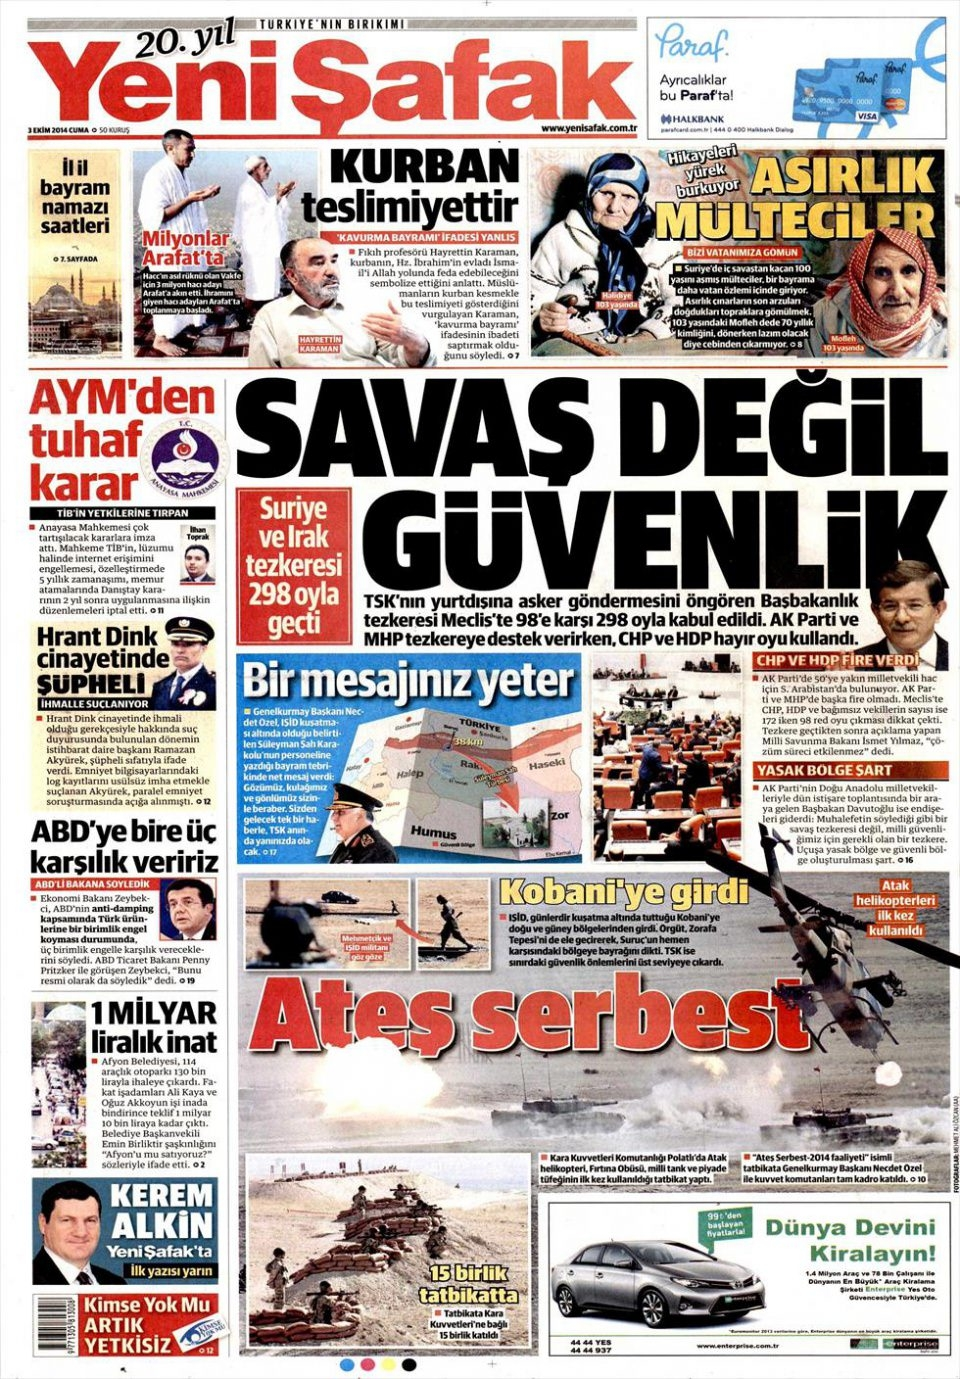 3 Ekim 2014 gazete manşetleri 24